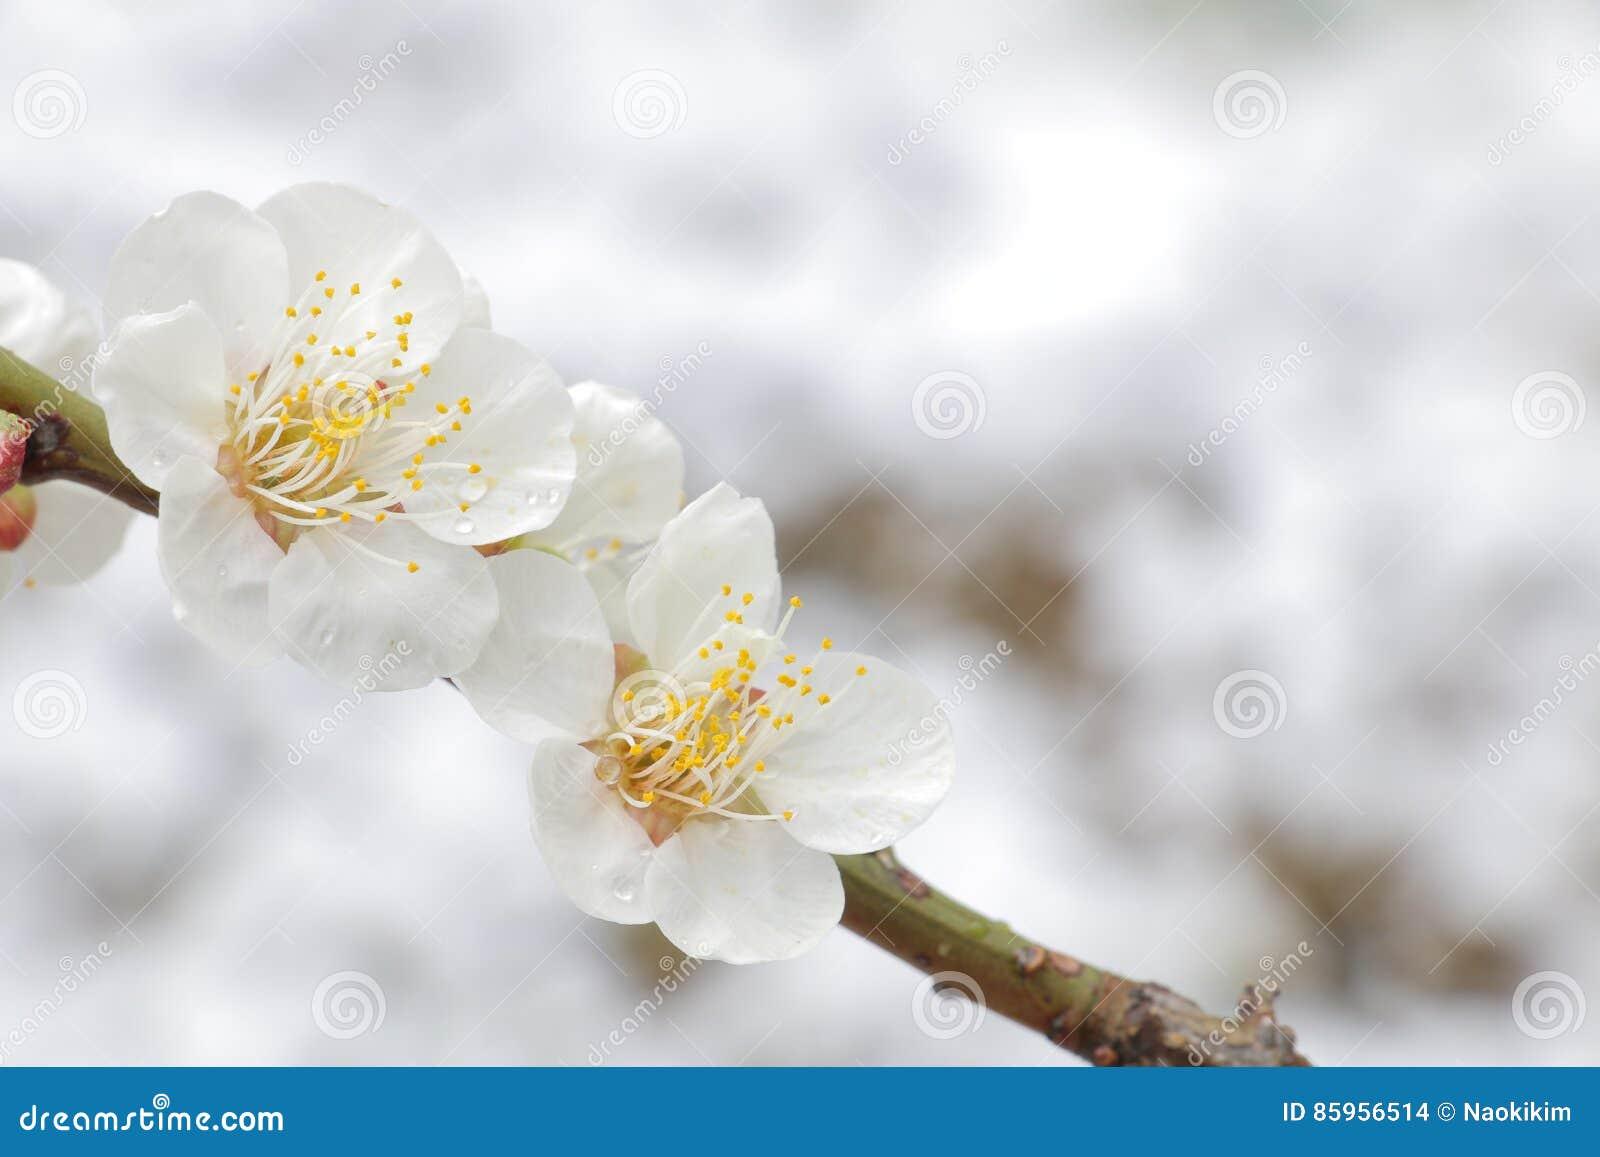 Japanese White Plum On Snow Background Stock Photo Image Of